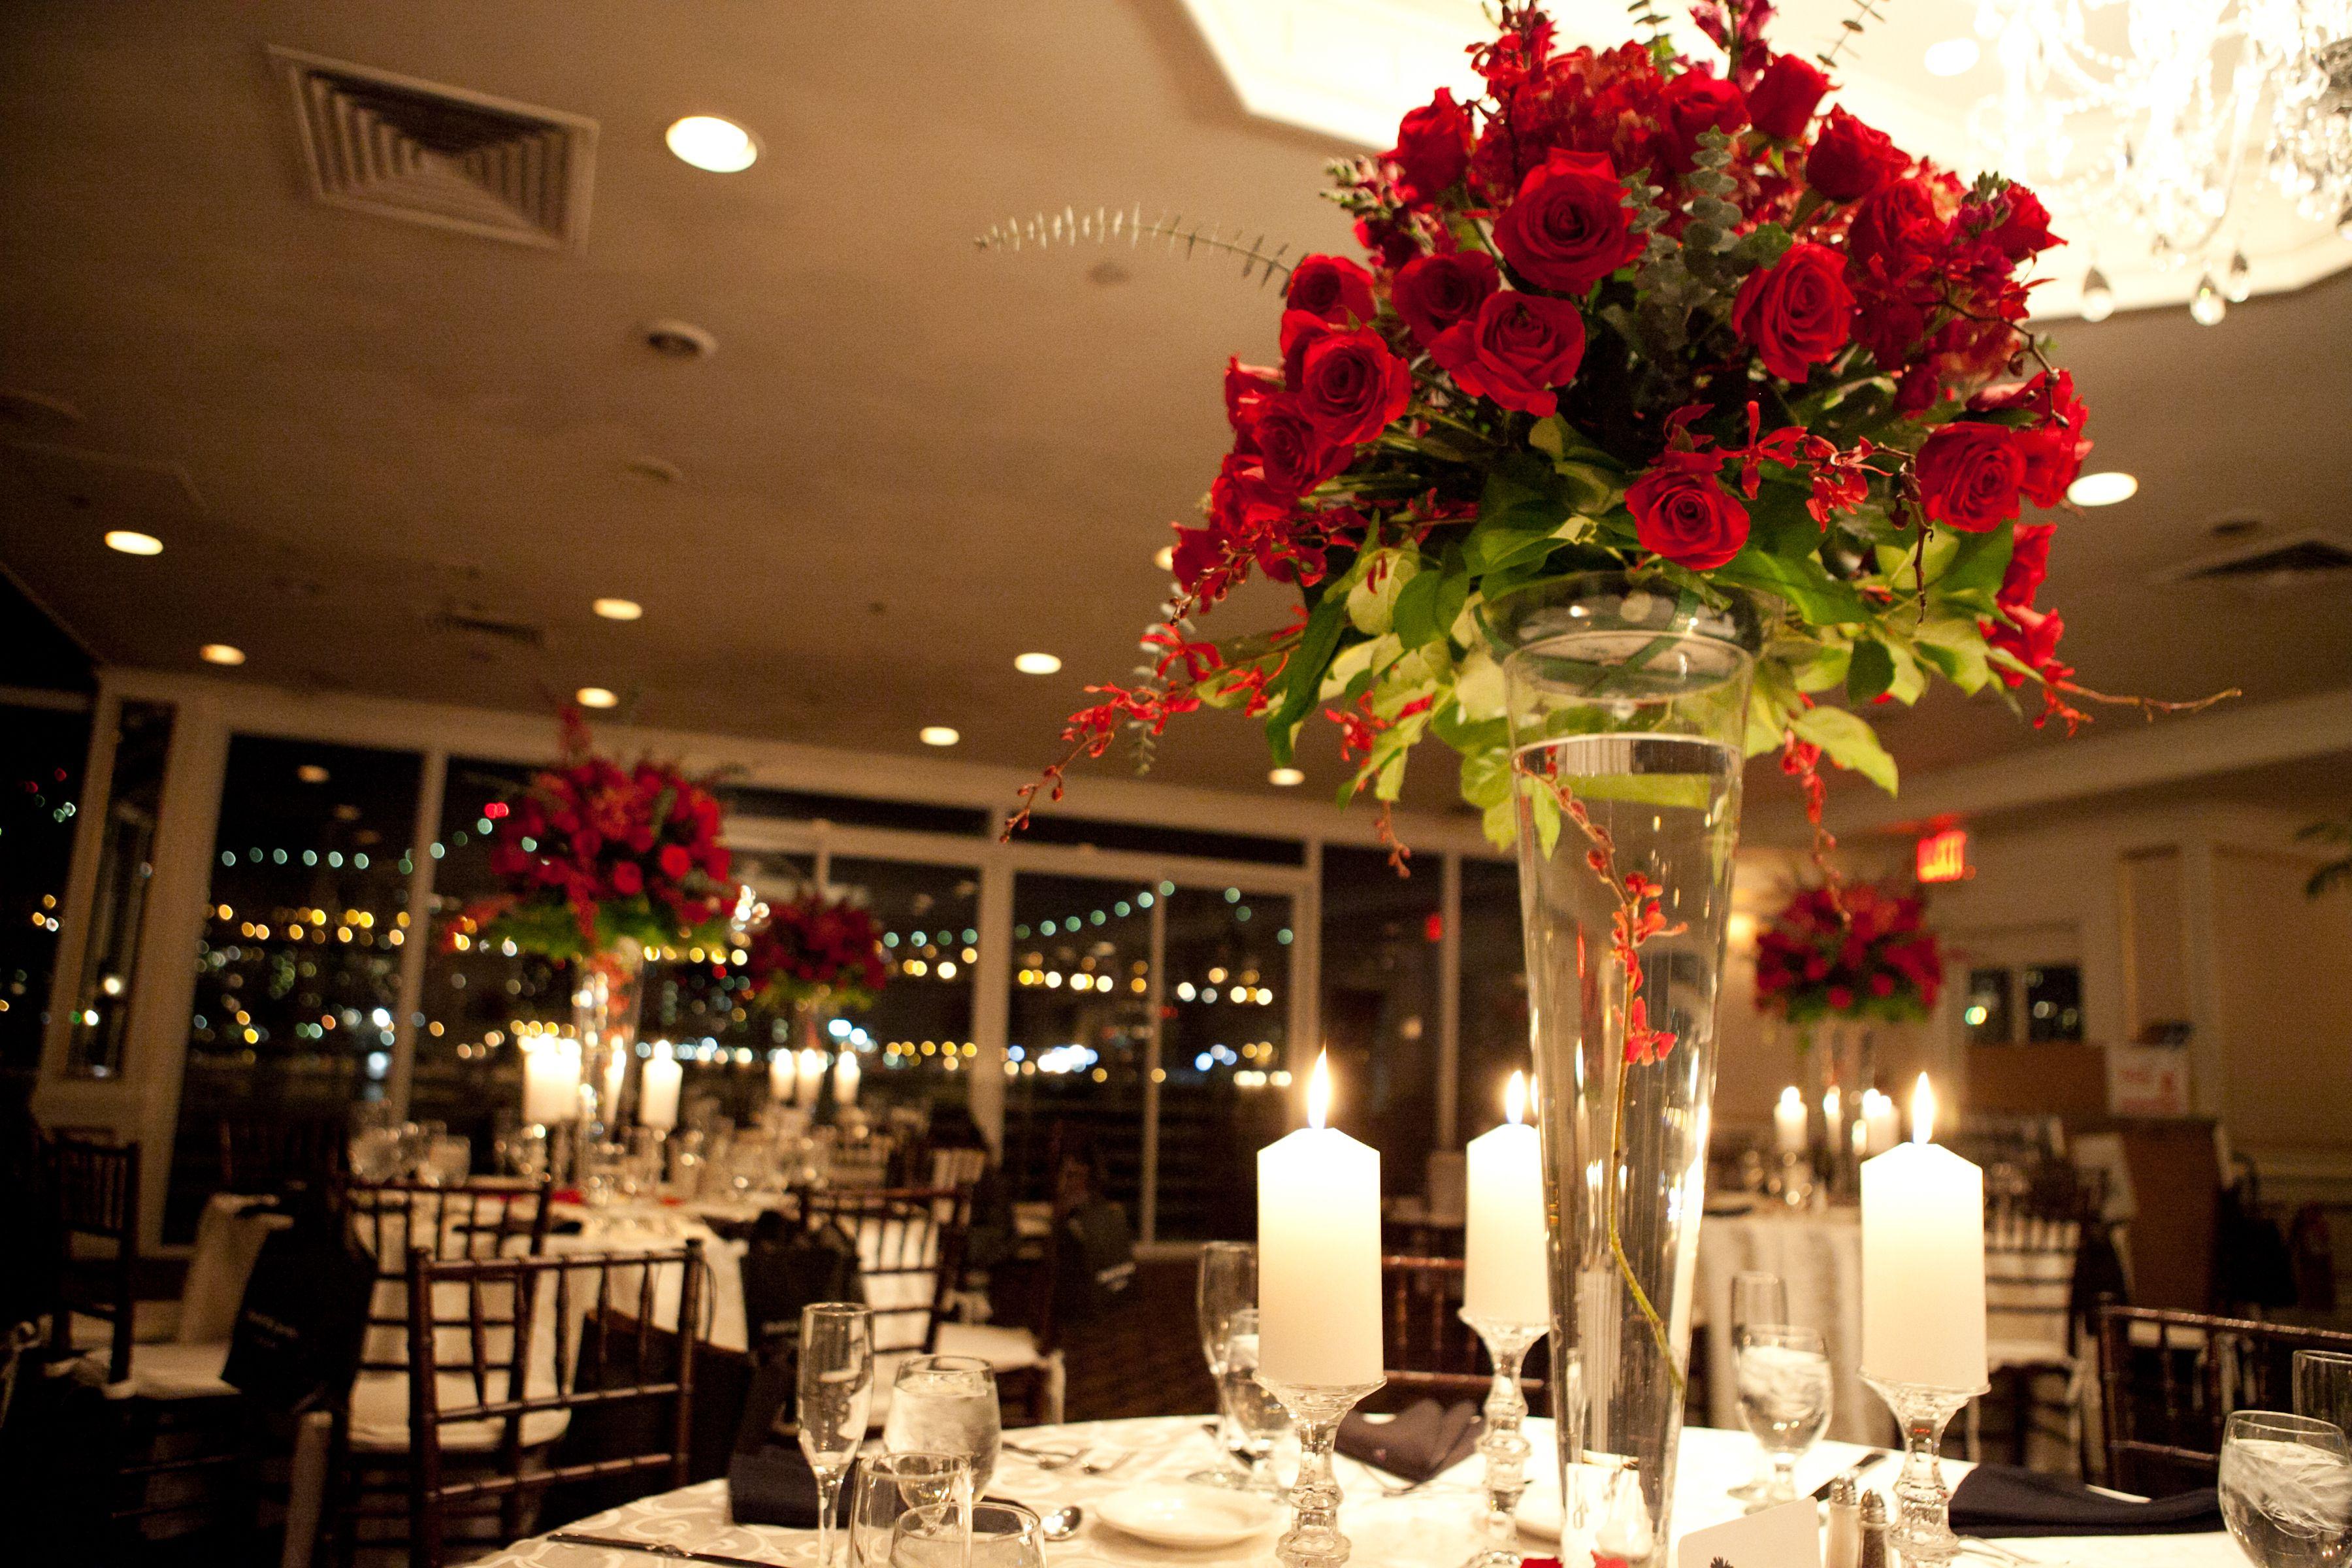 Classic Red Rose Centerpieces )